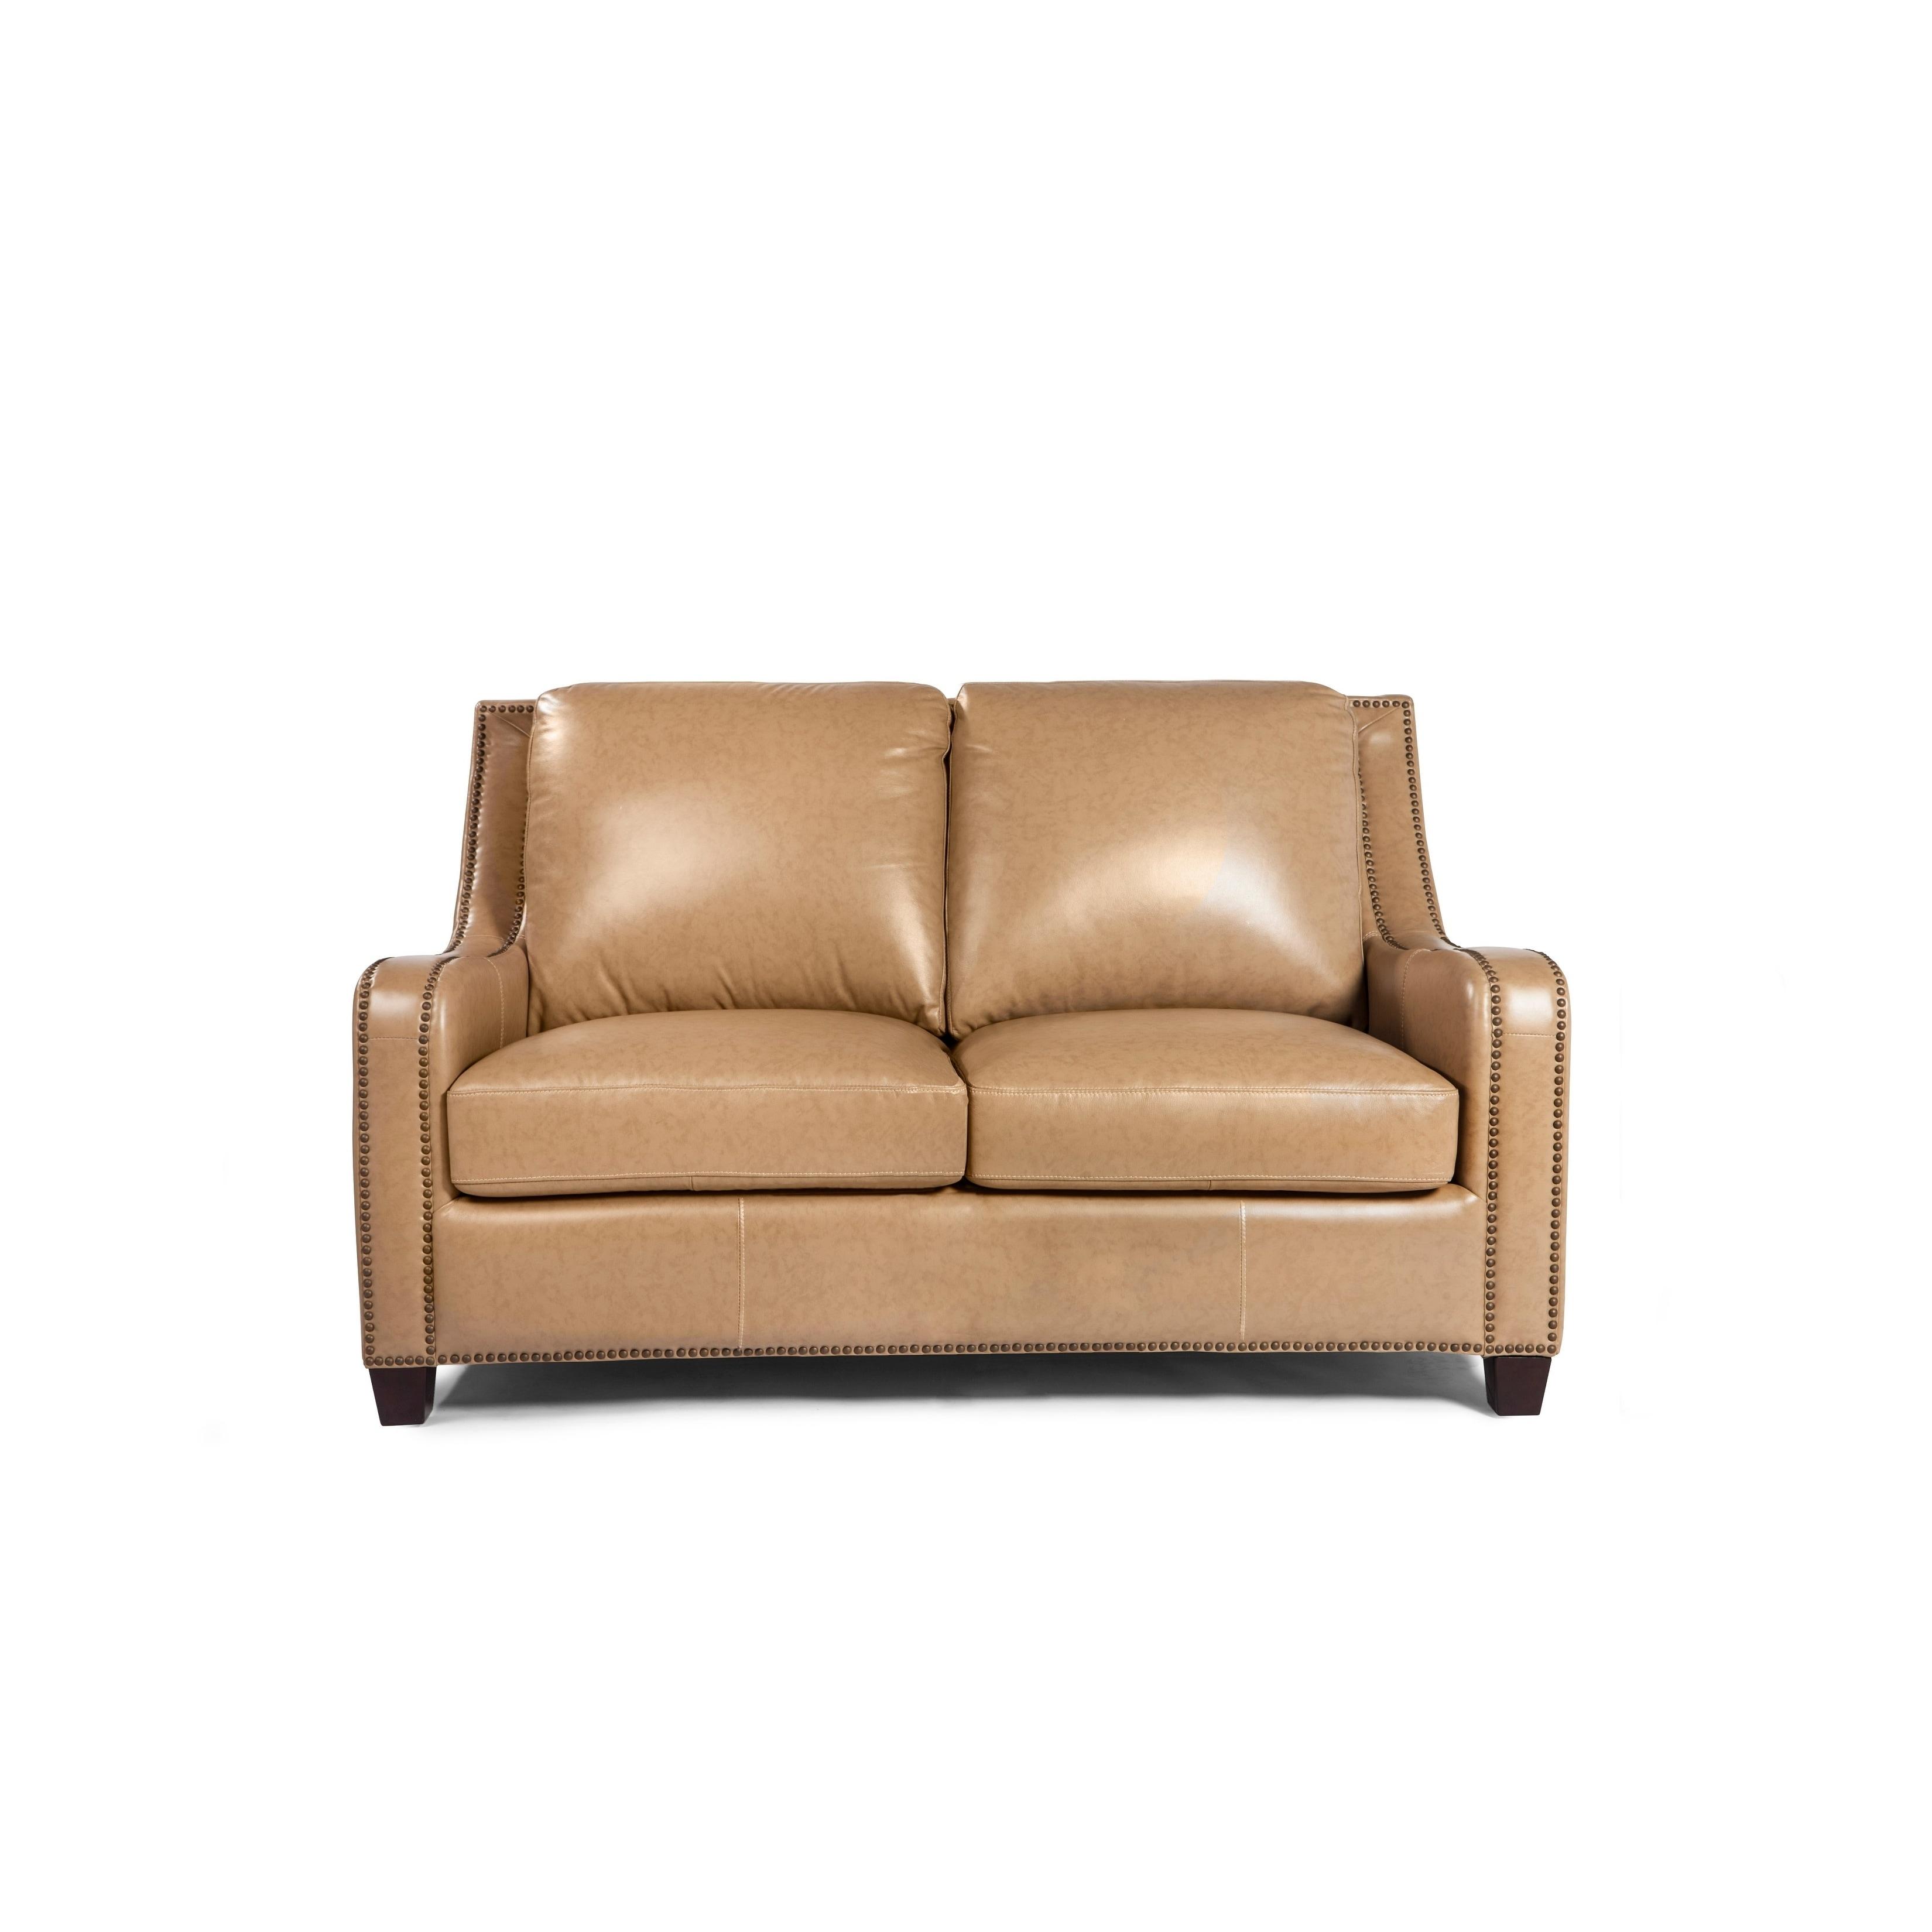 Lazzaro Leather Denver Sofa Free Shipping Today 17993078